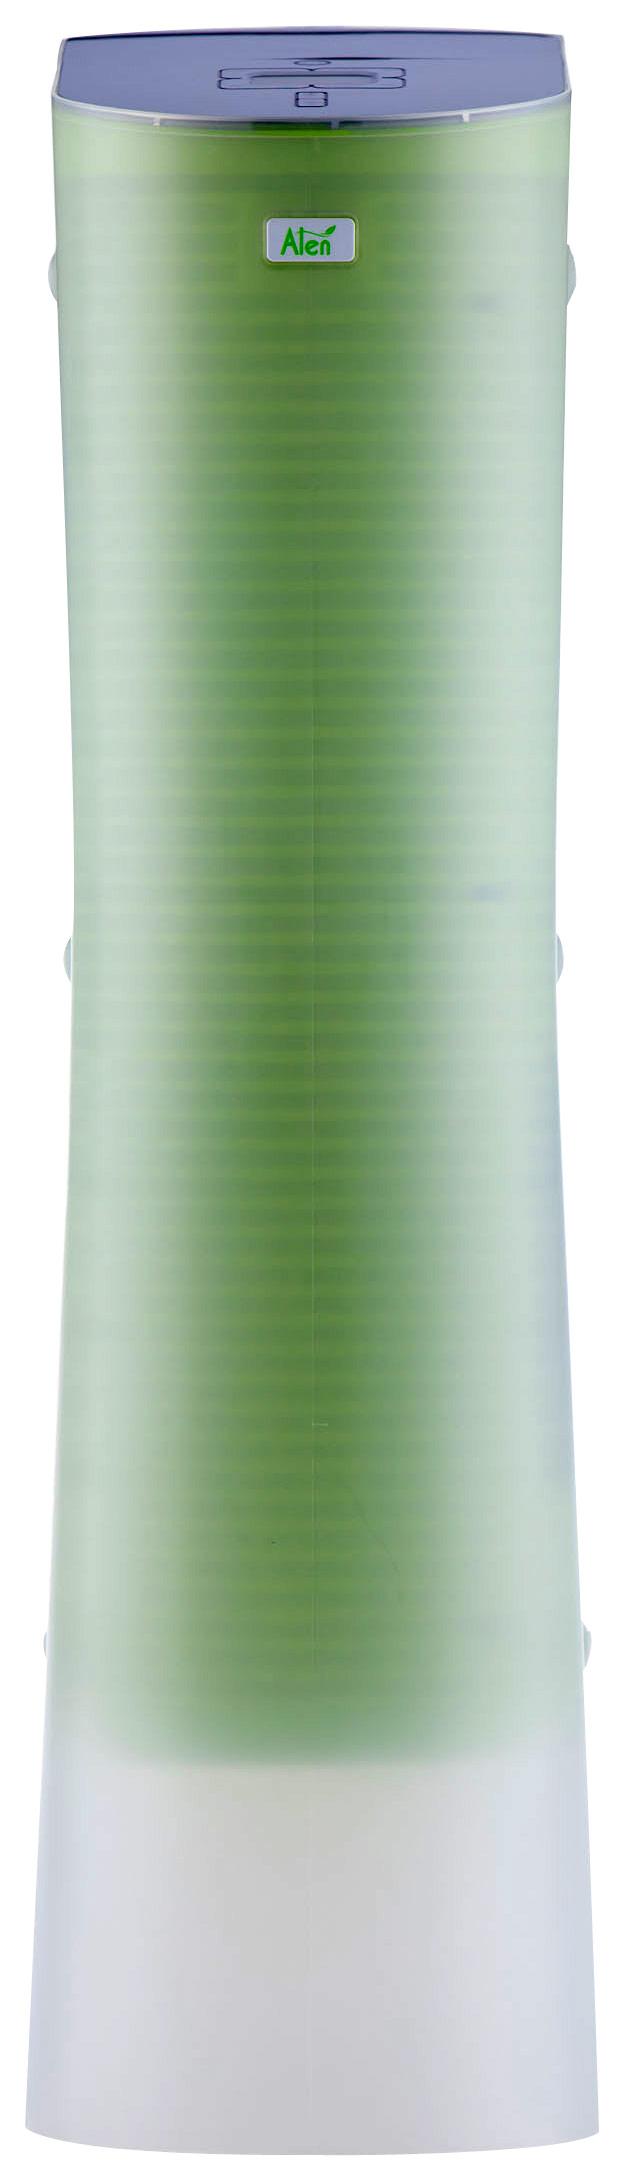 Alen - Paralda Tower Air Purifier - Green